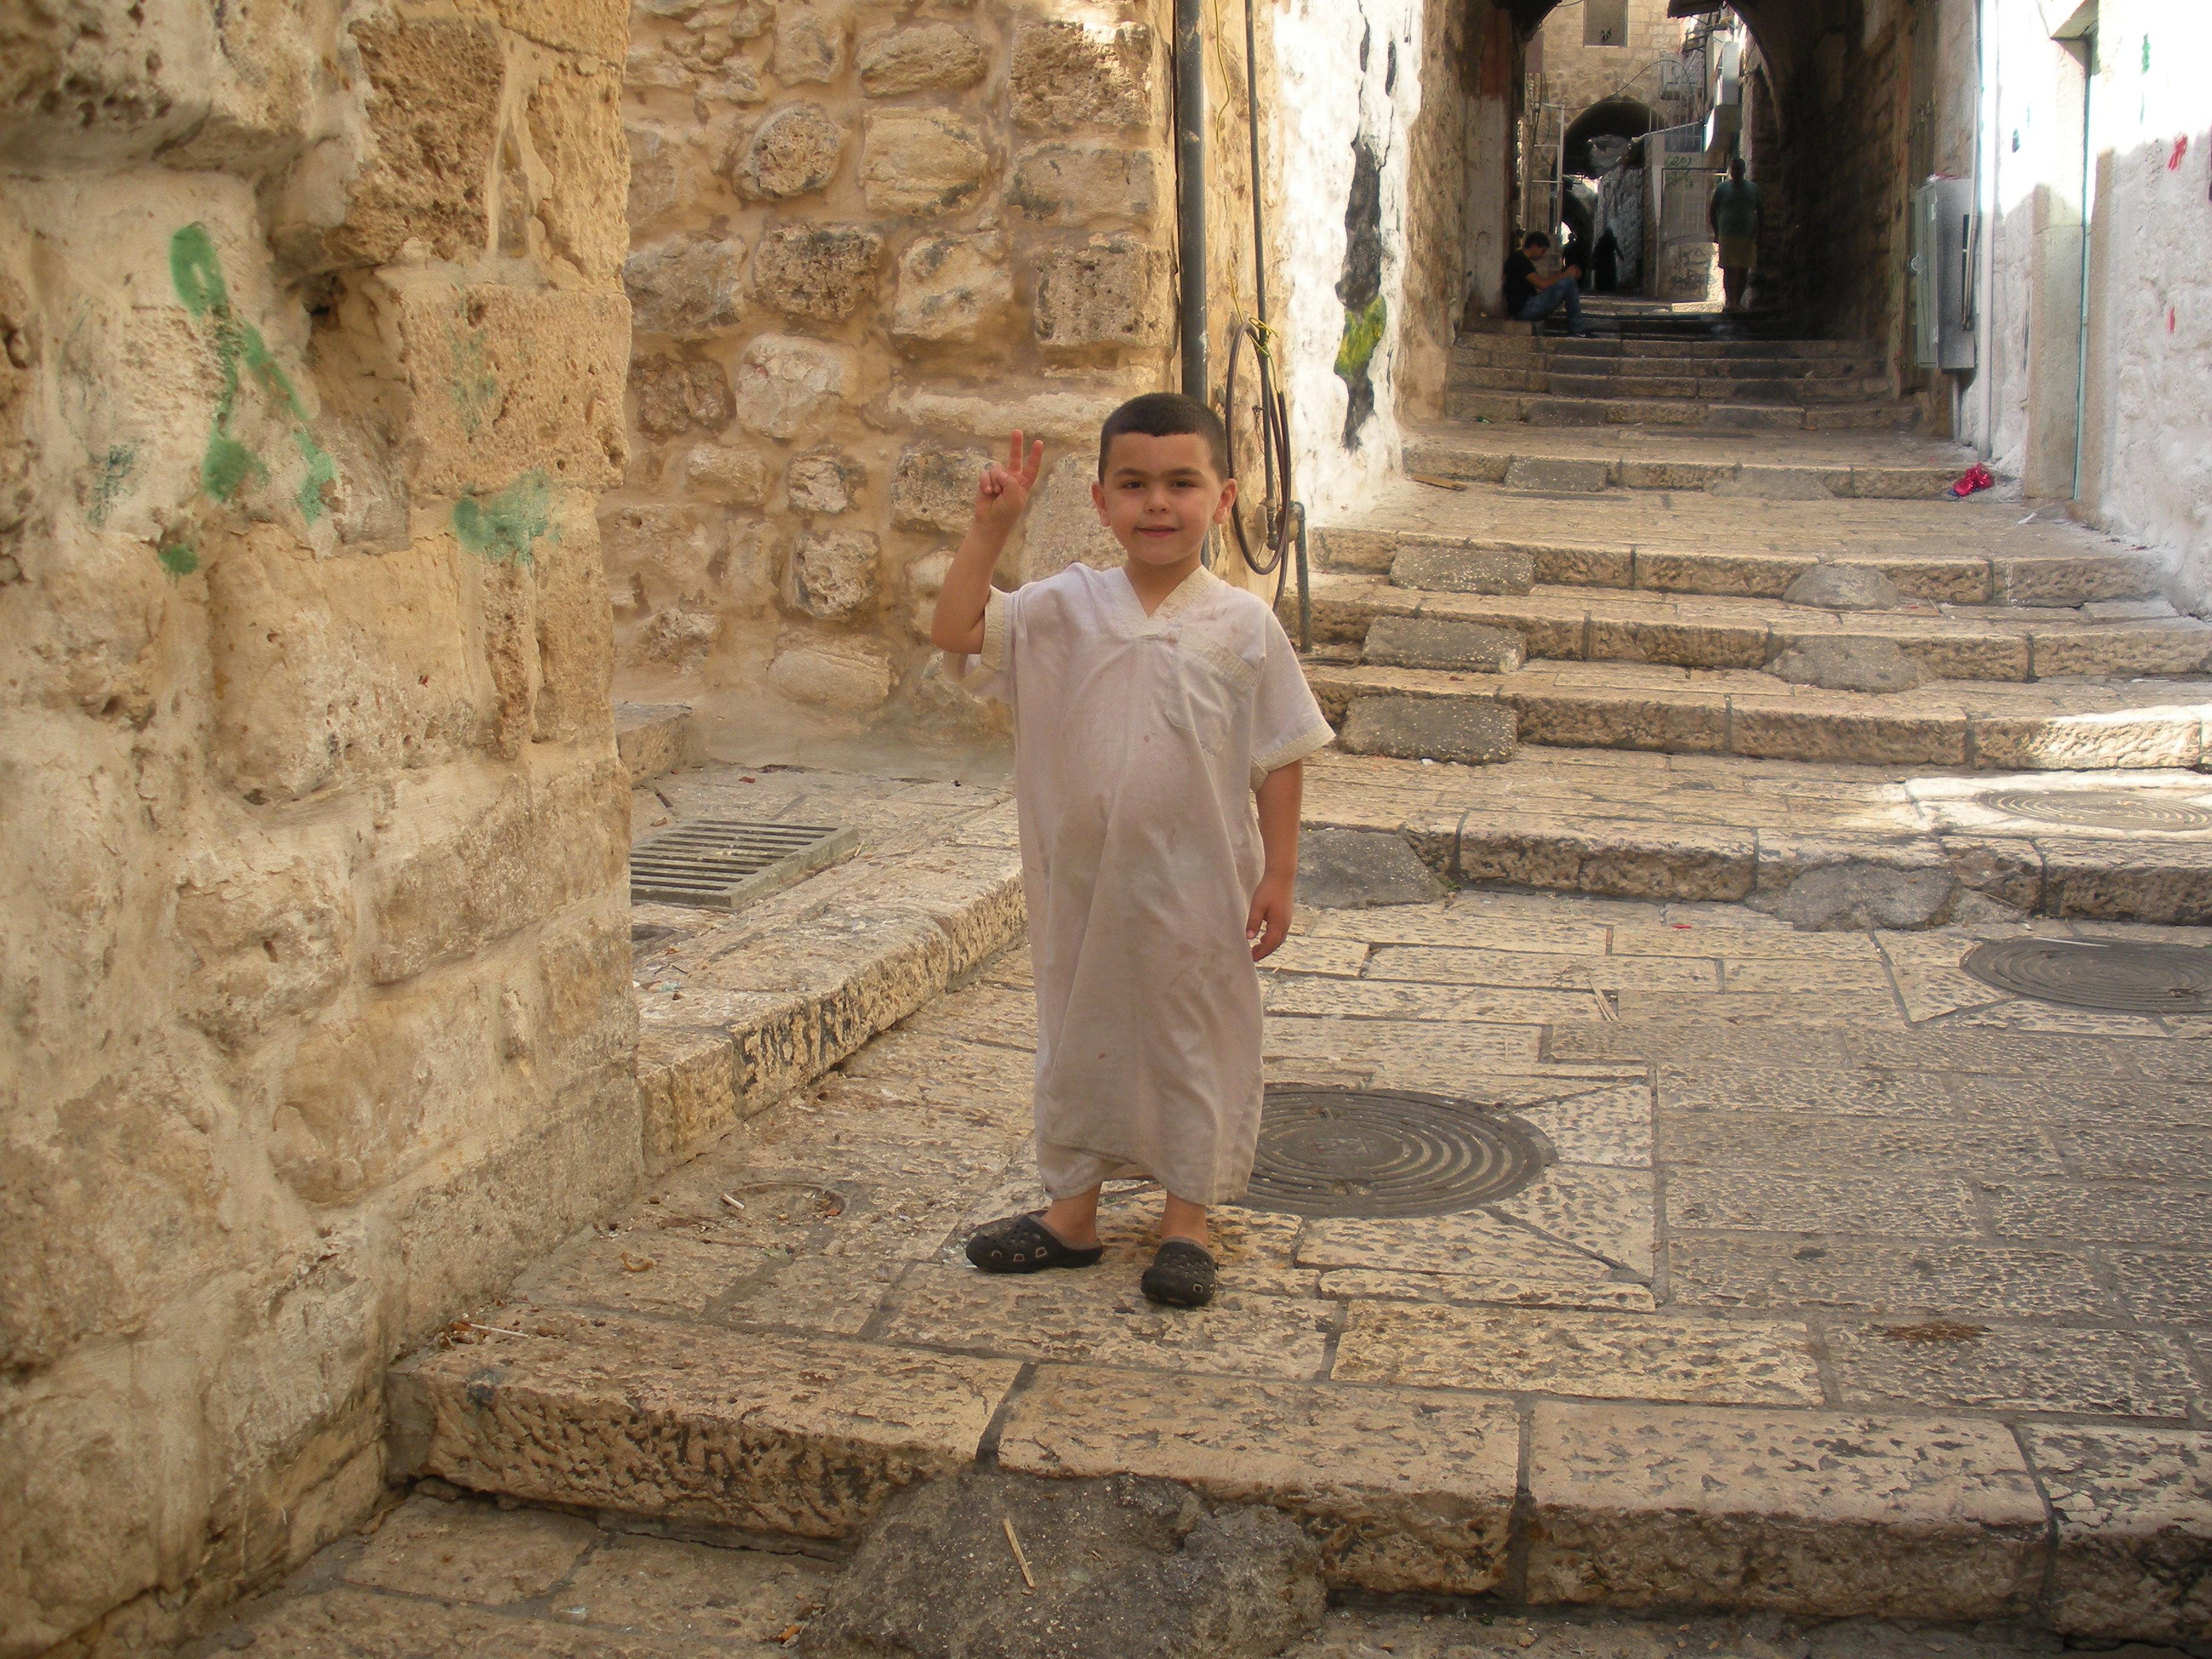 Lebanon-Jordan-IsraelPalestine_SepOct2015_058.JPG